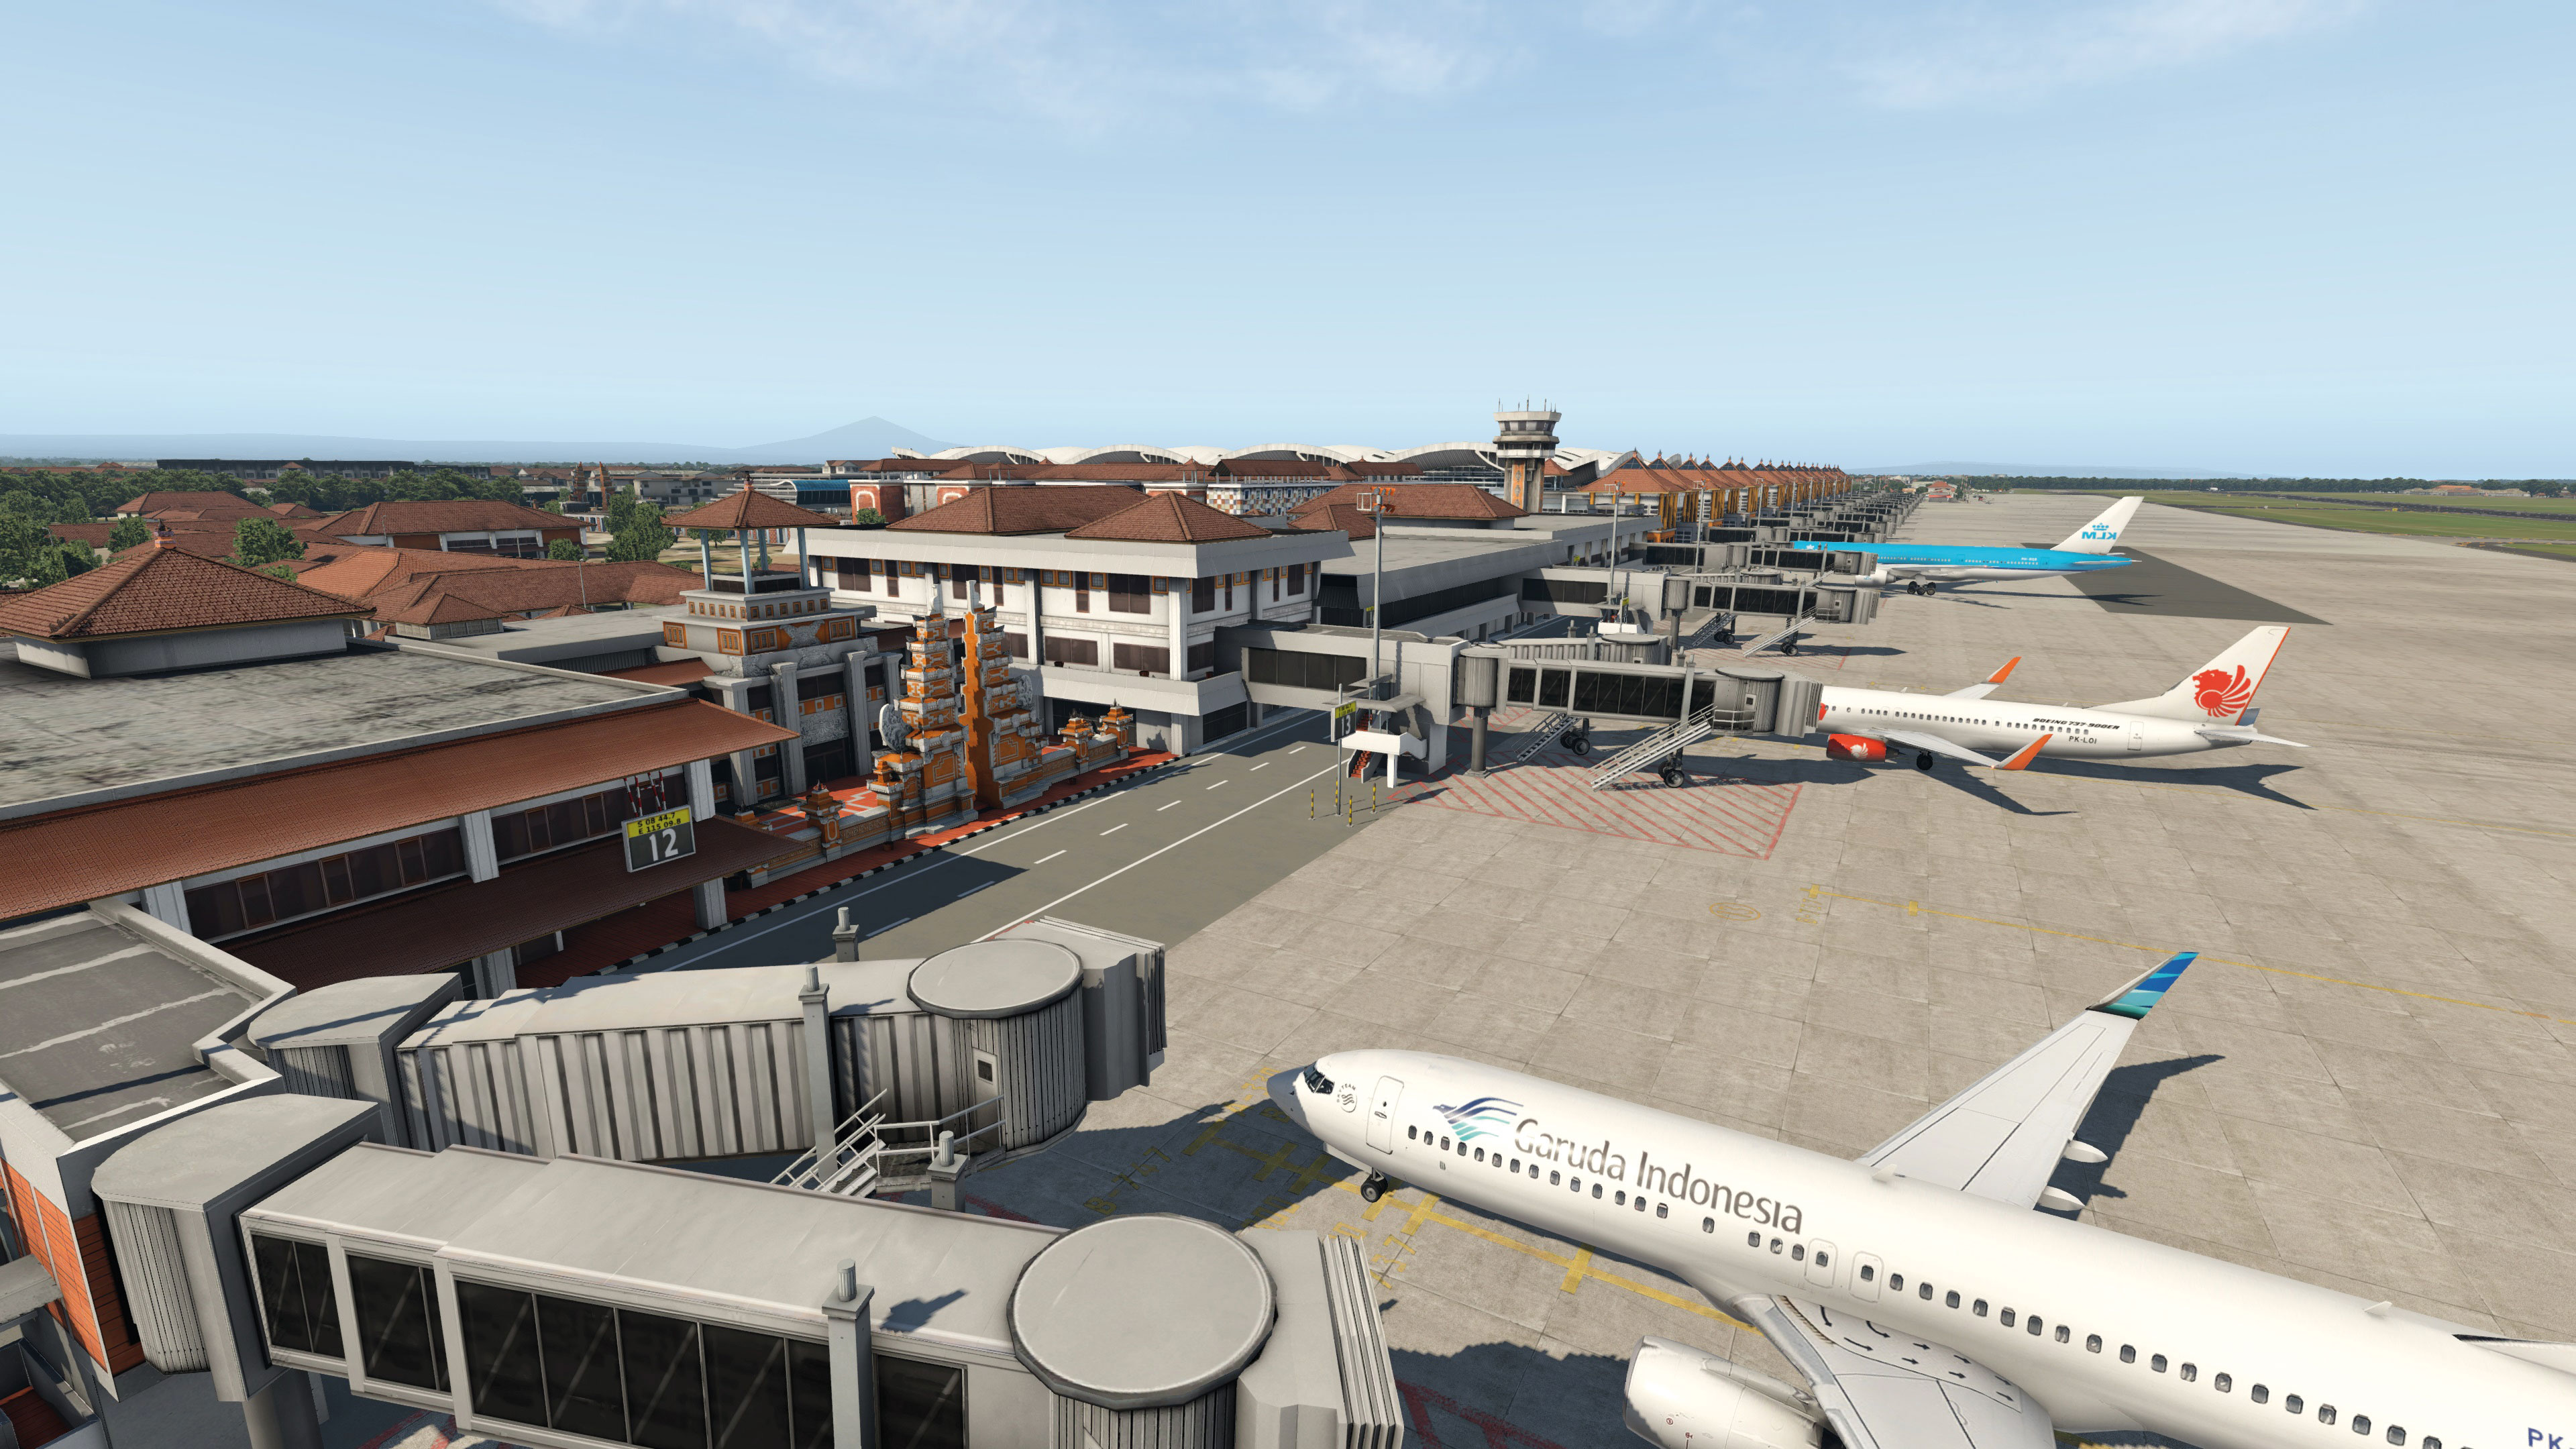 Aeroporto Bali : Airport bali for plane by aerosoft